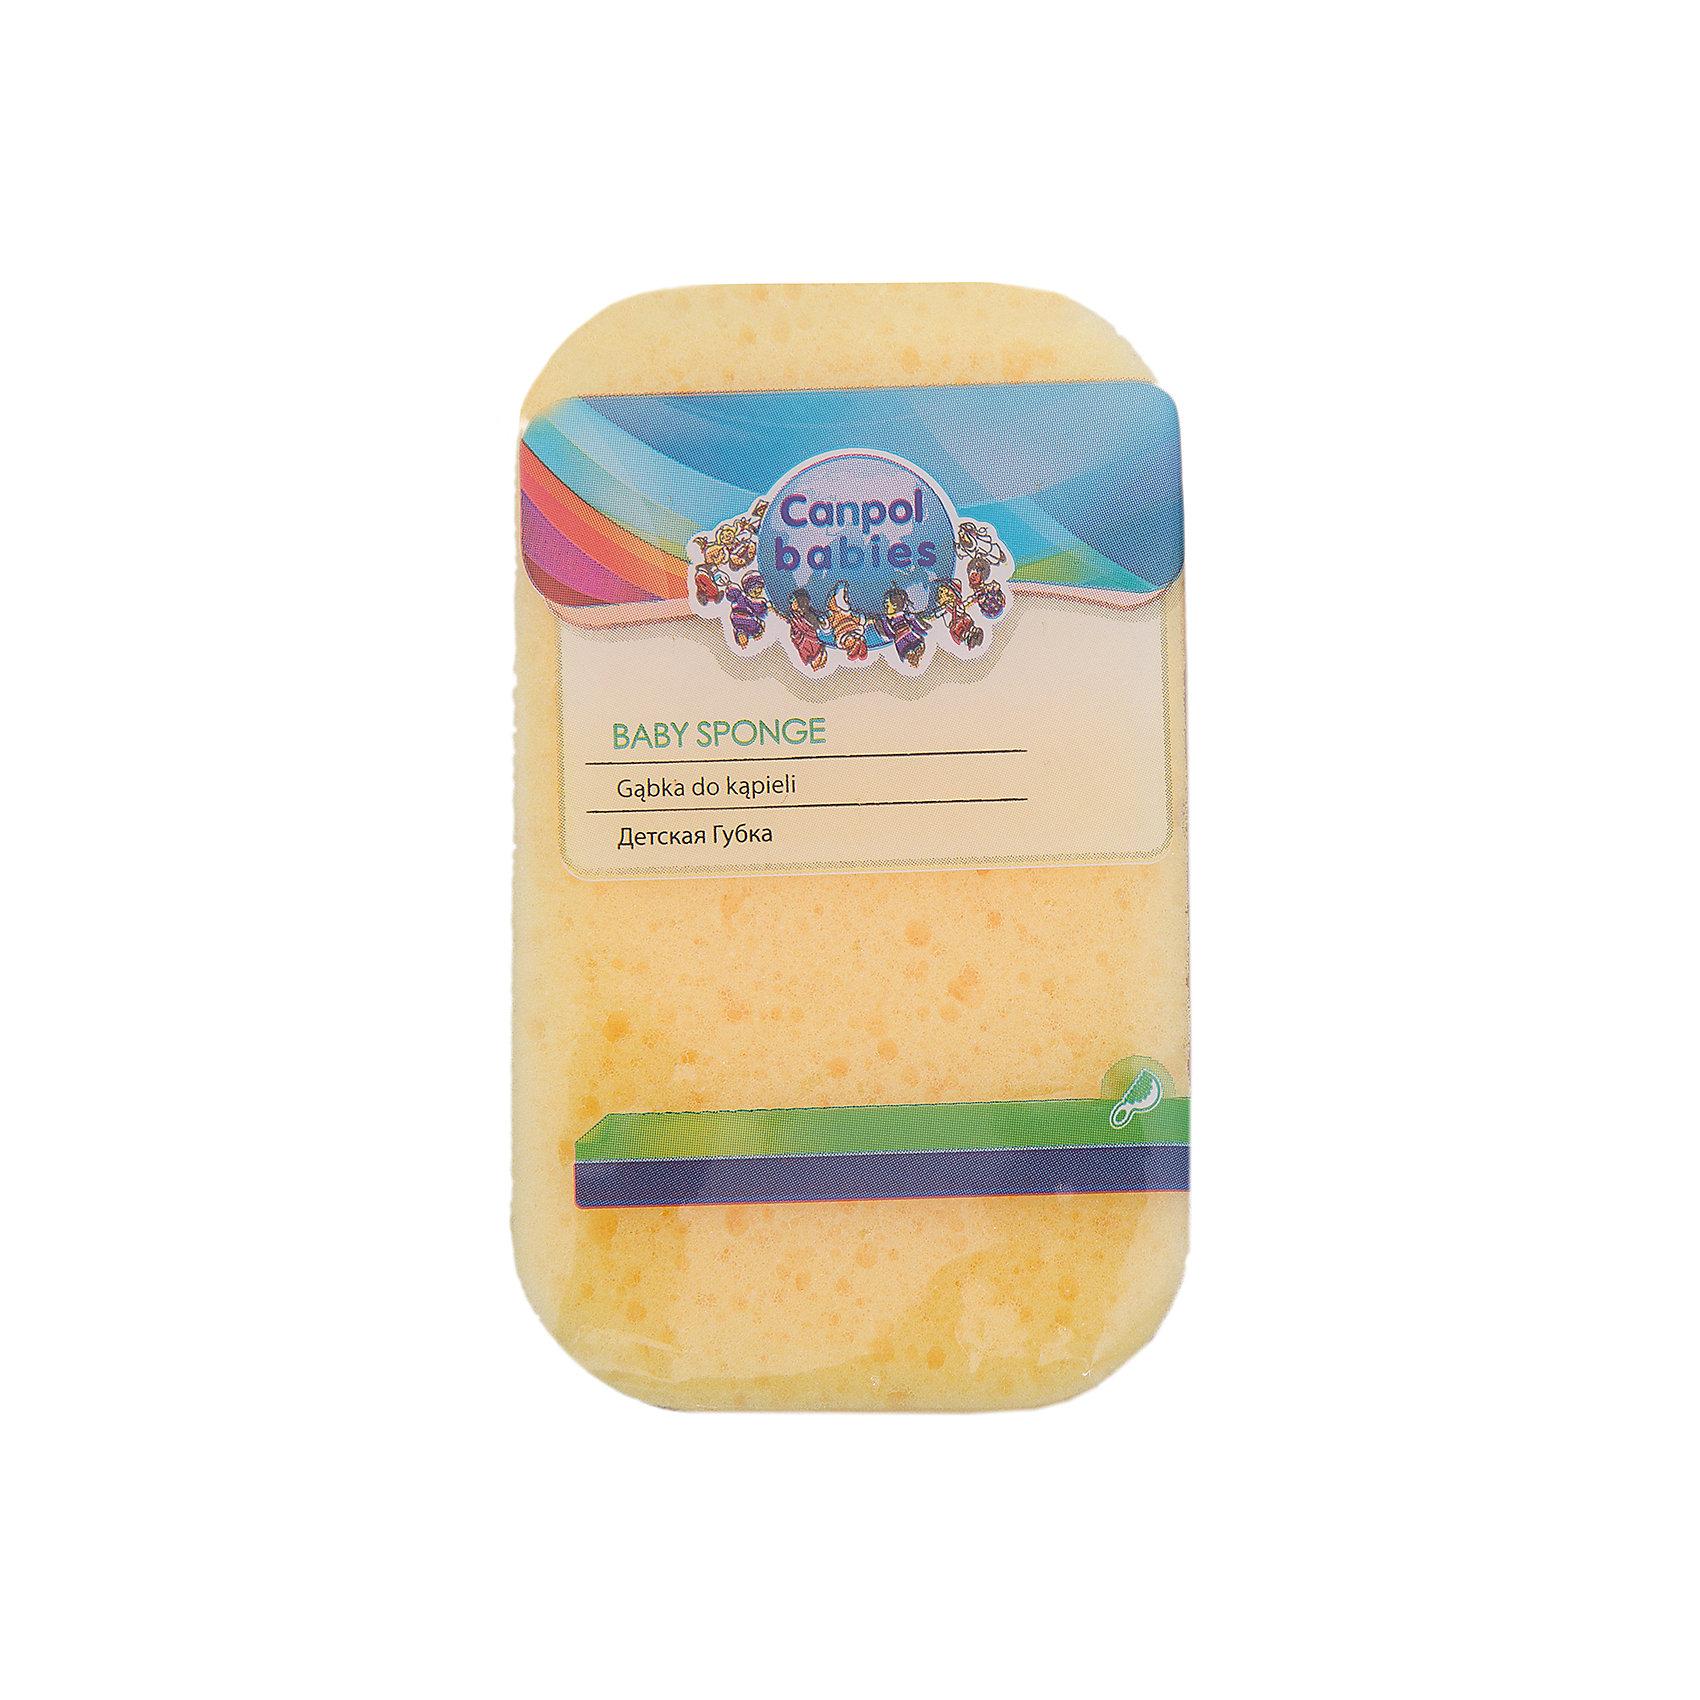 Canpol Babies Губка Коралл, Canpol Babies, желтый  canpol babies губка для купания marble цвет голубой